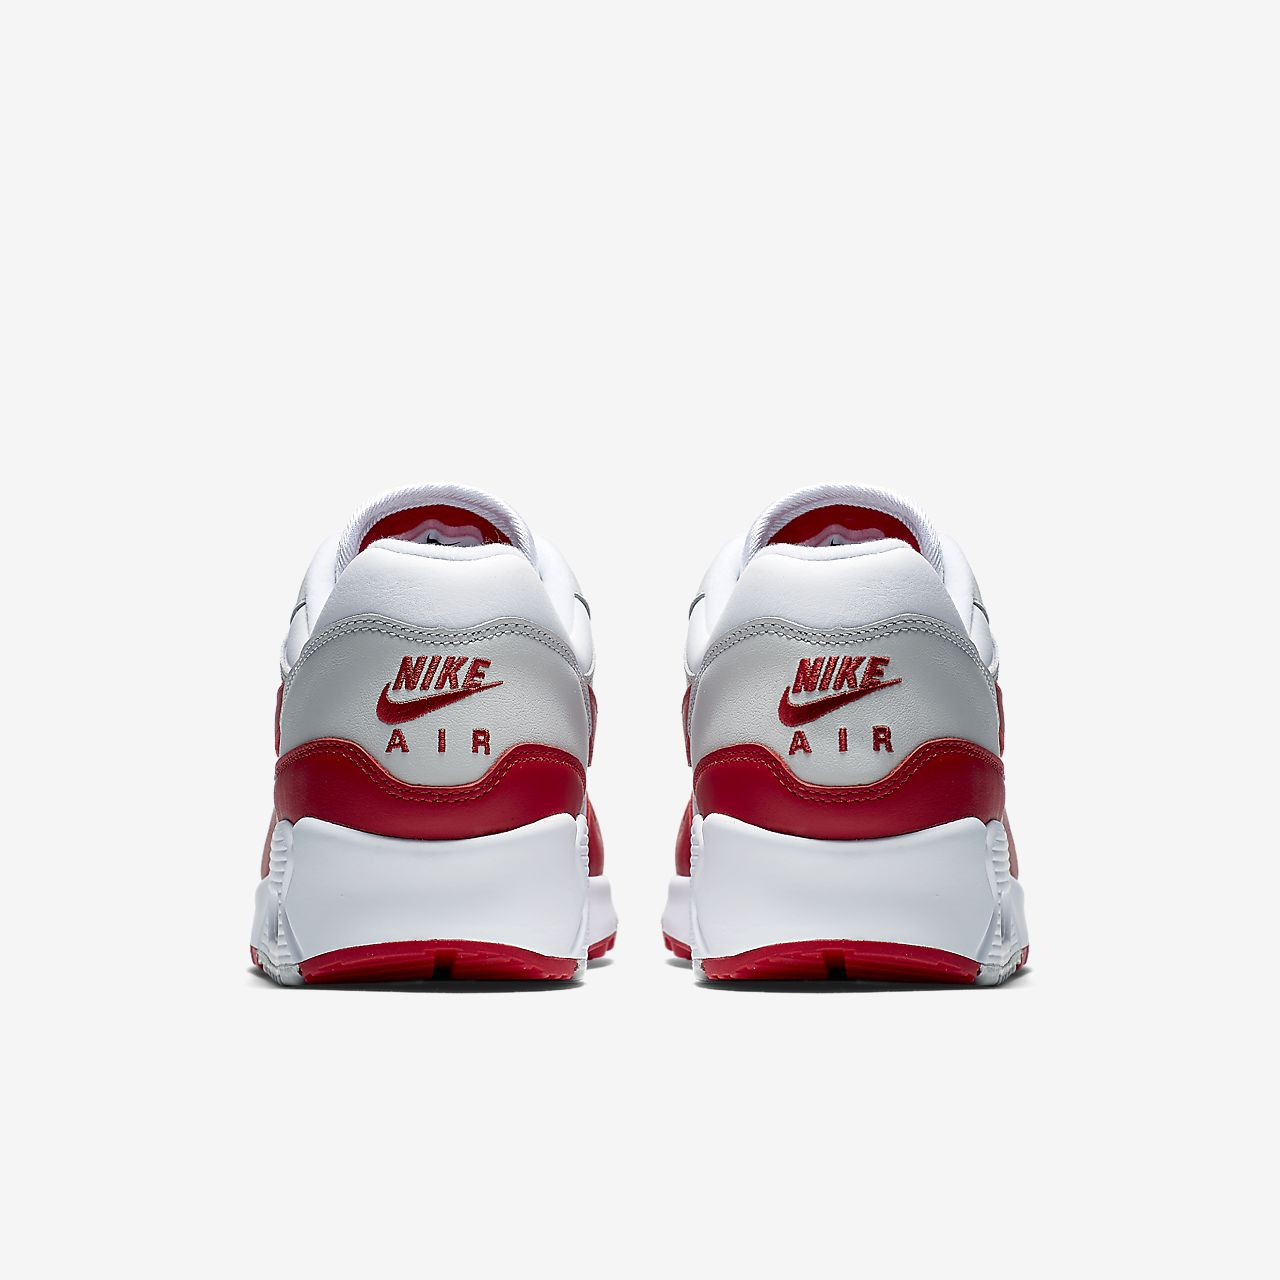 competitive price 54116 274da ... Nike Air Max 90 1 Men s Shoe